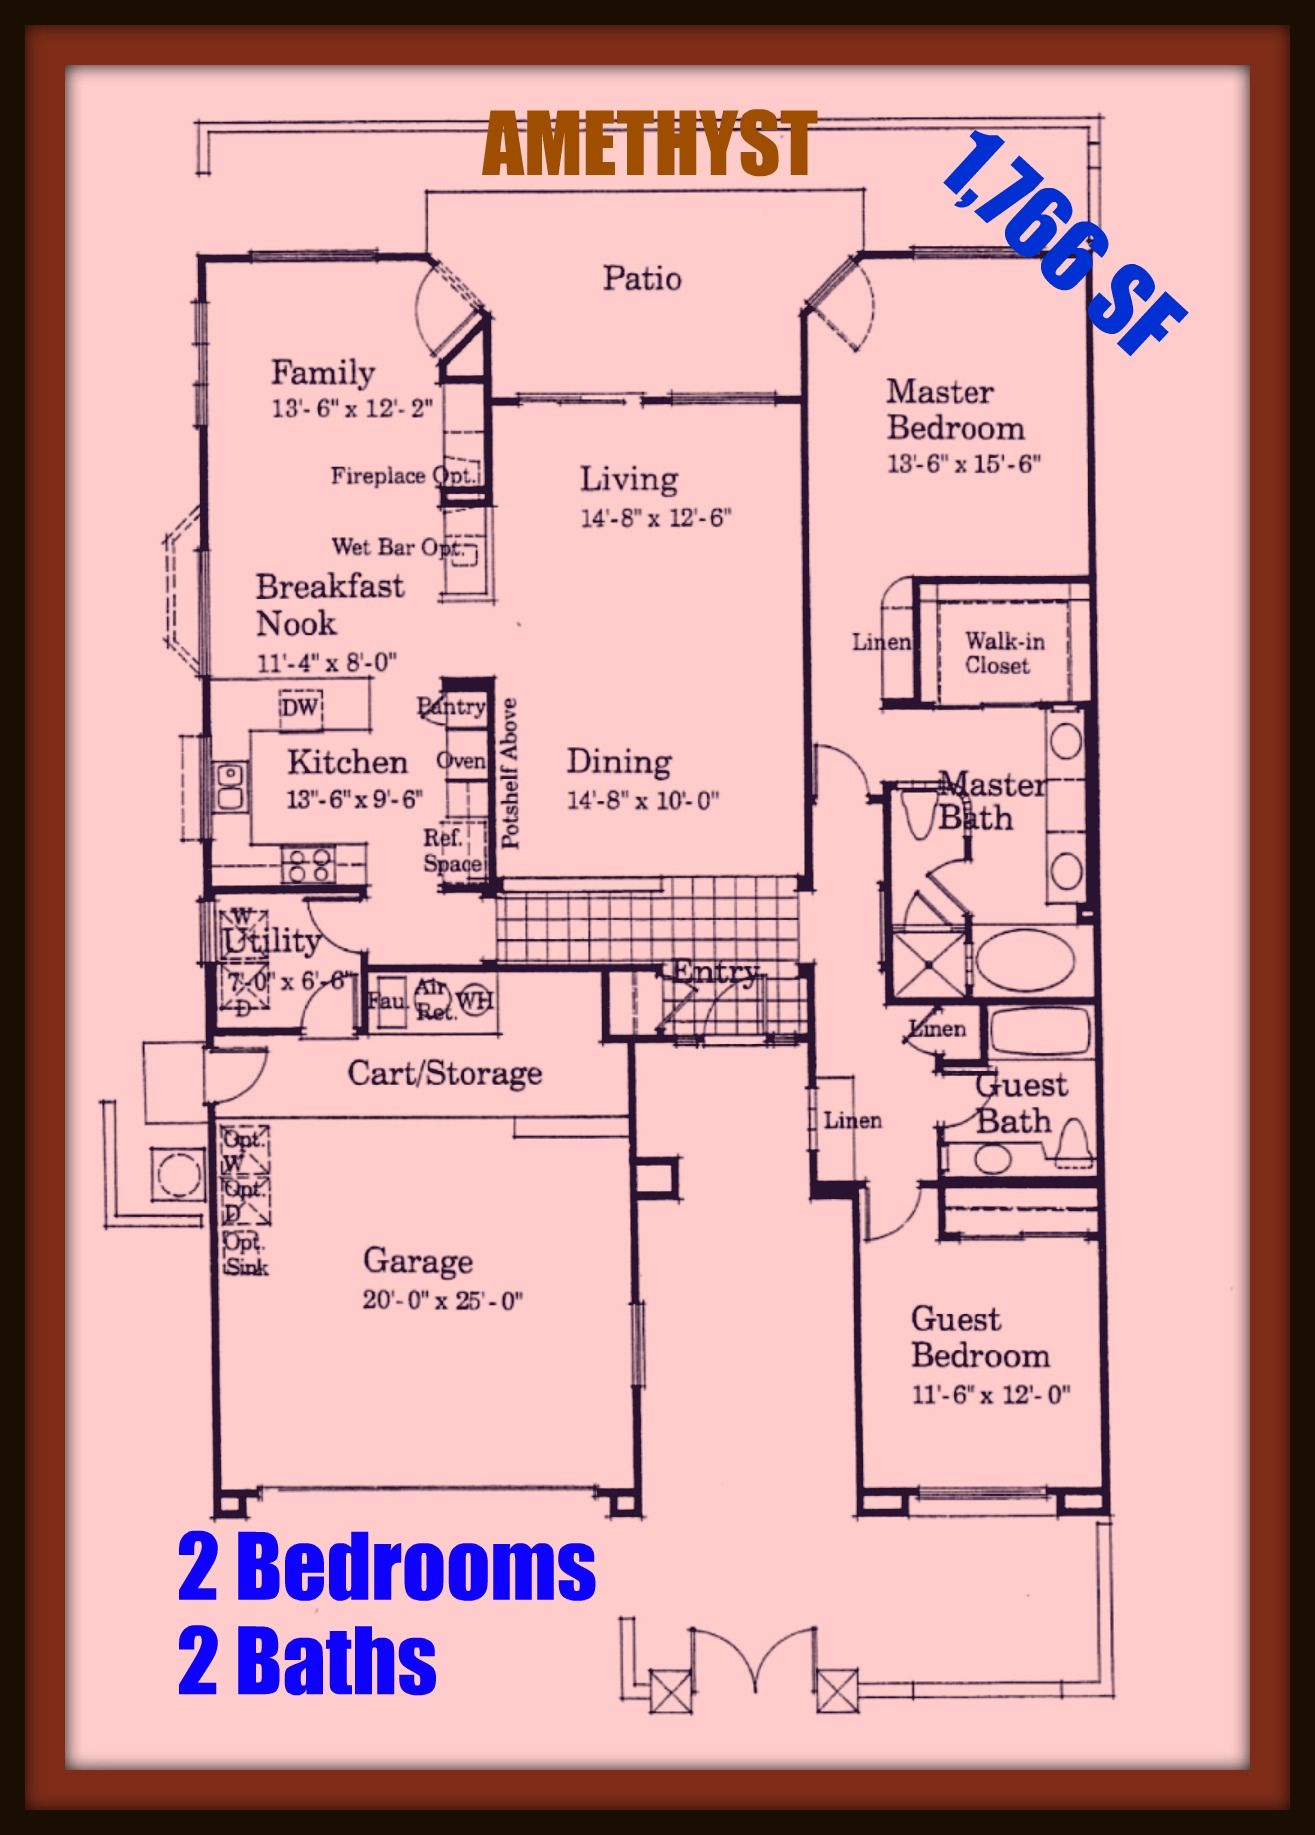 SUN CITY PALM DESERT CA floor plan for the AMETHYST model The #0: ba28d5f0b9594df a7449c5